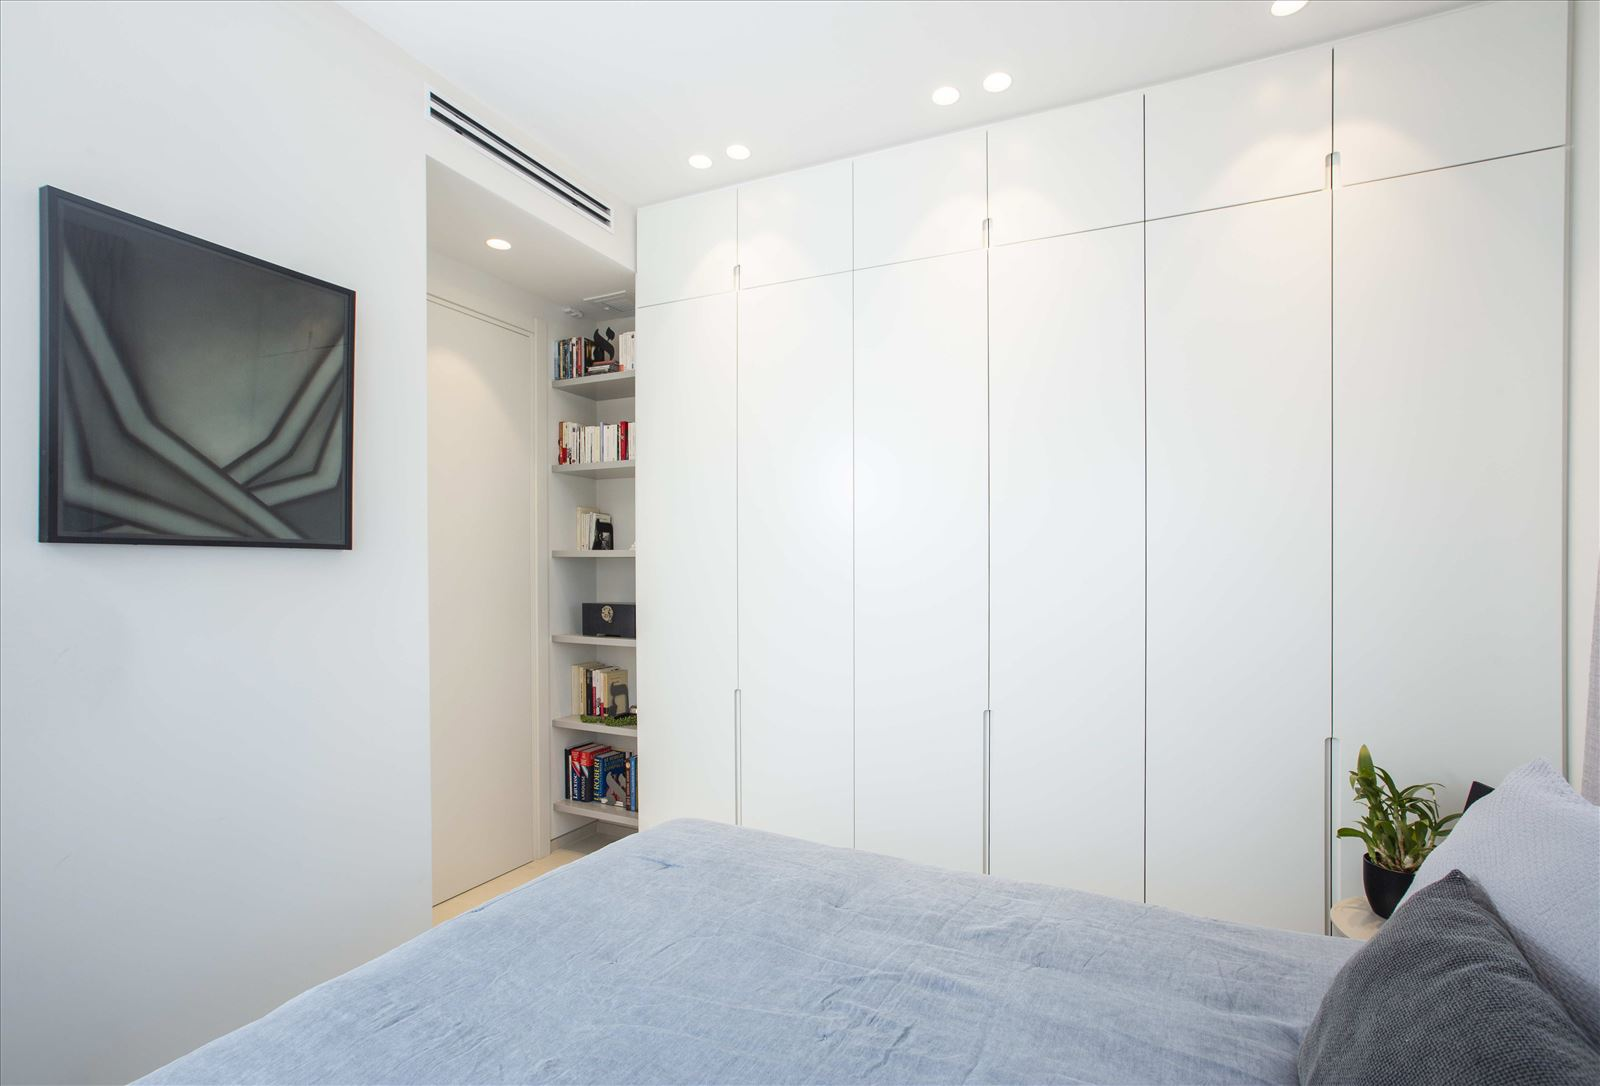 Tel Aviv apartment in Parisian aroma תאורה בחדר על ידי דורי קמחי